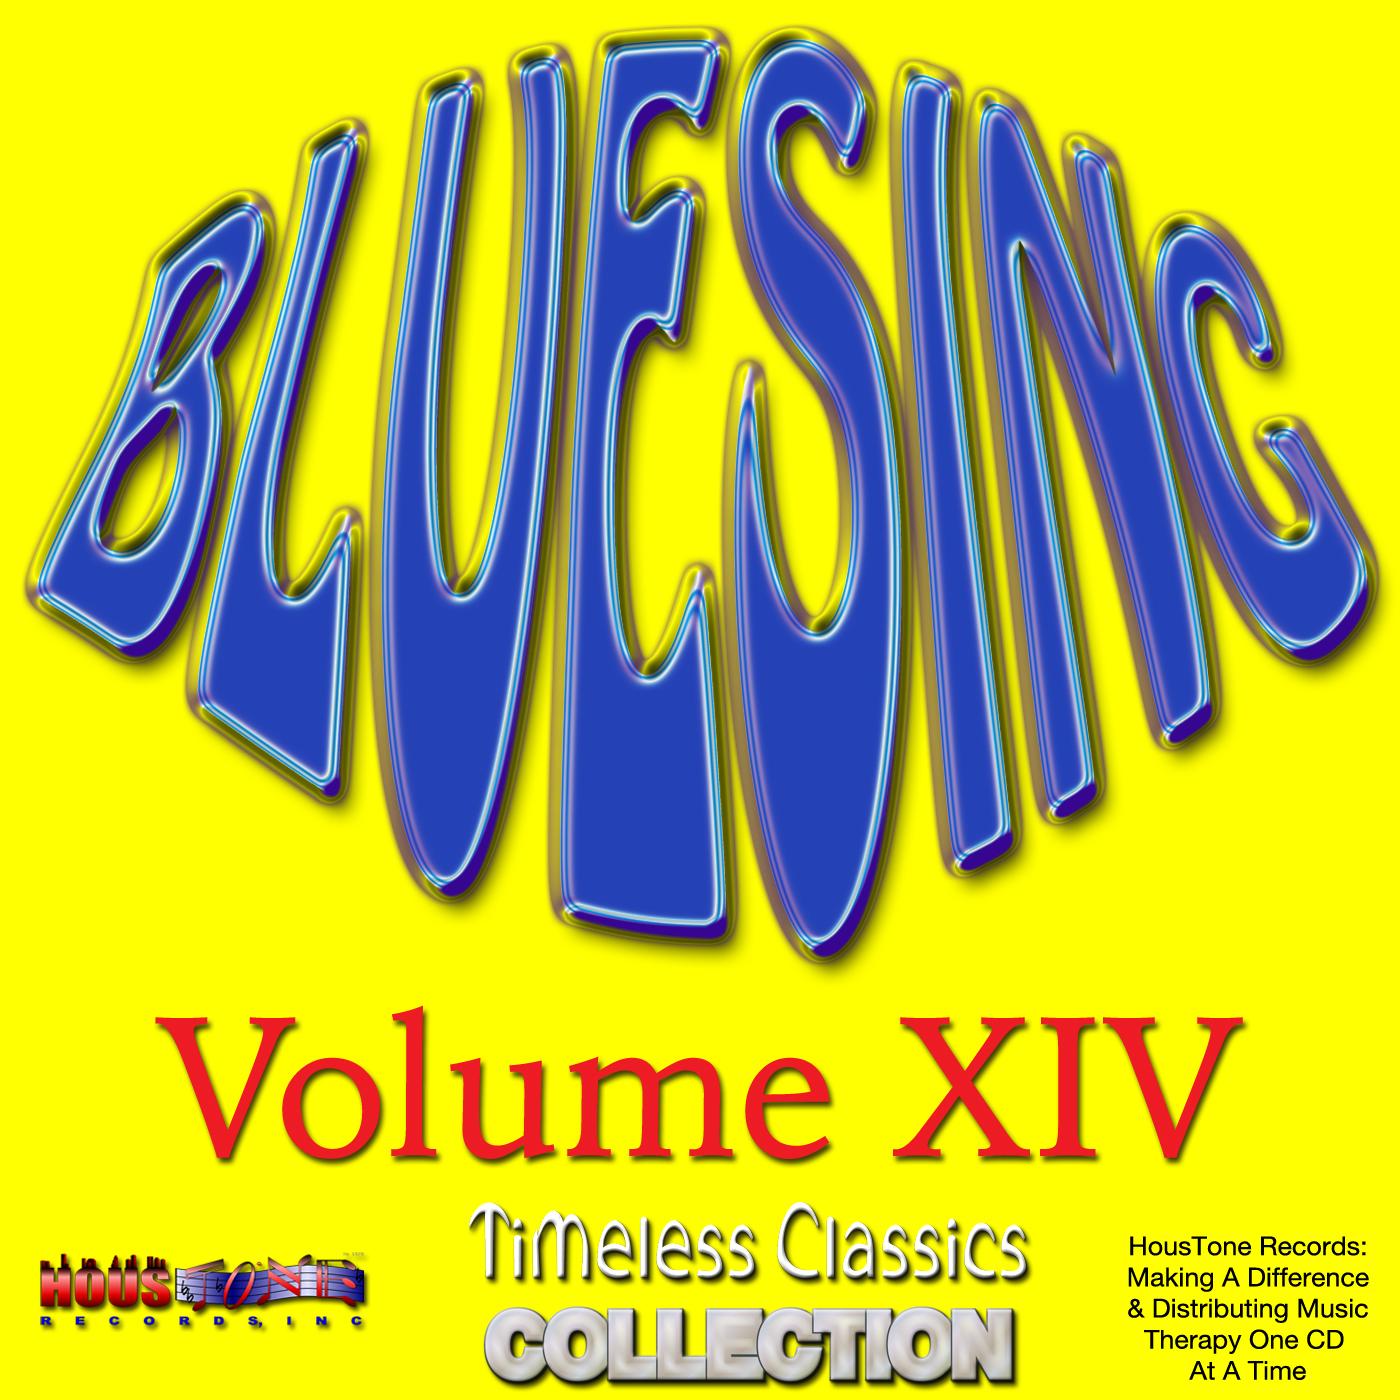 Timeless Classics Volume XIV Bluesing New CD Playlist Release, Announcement